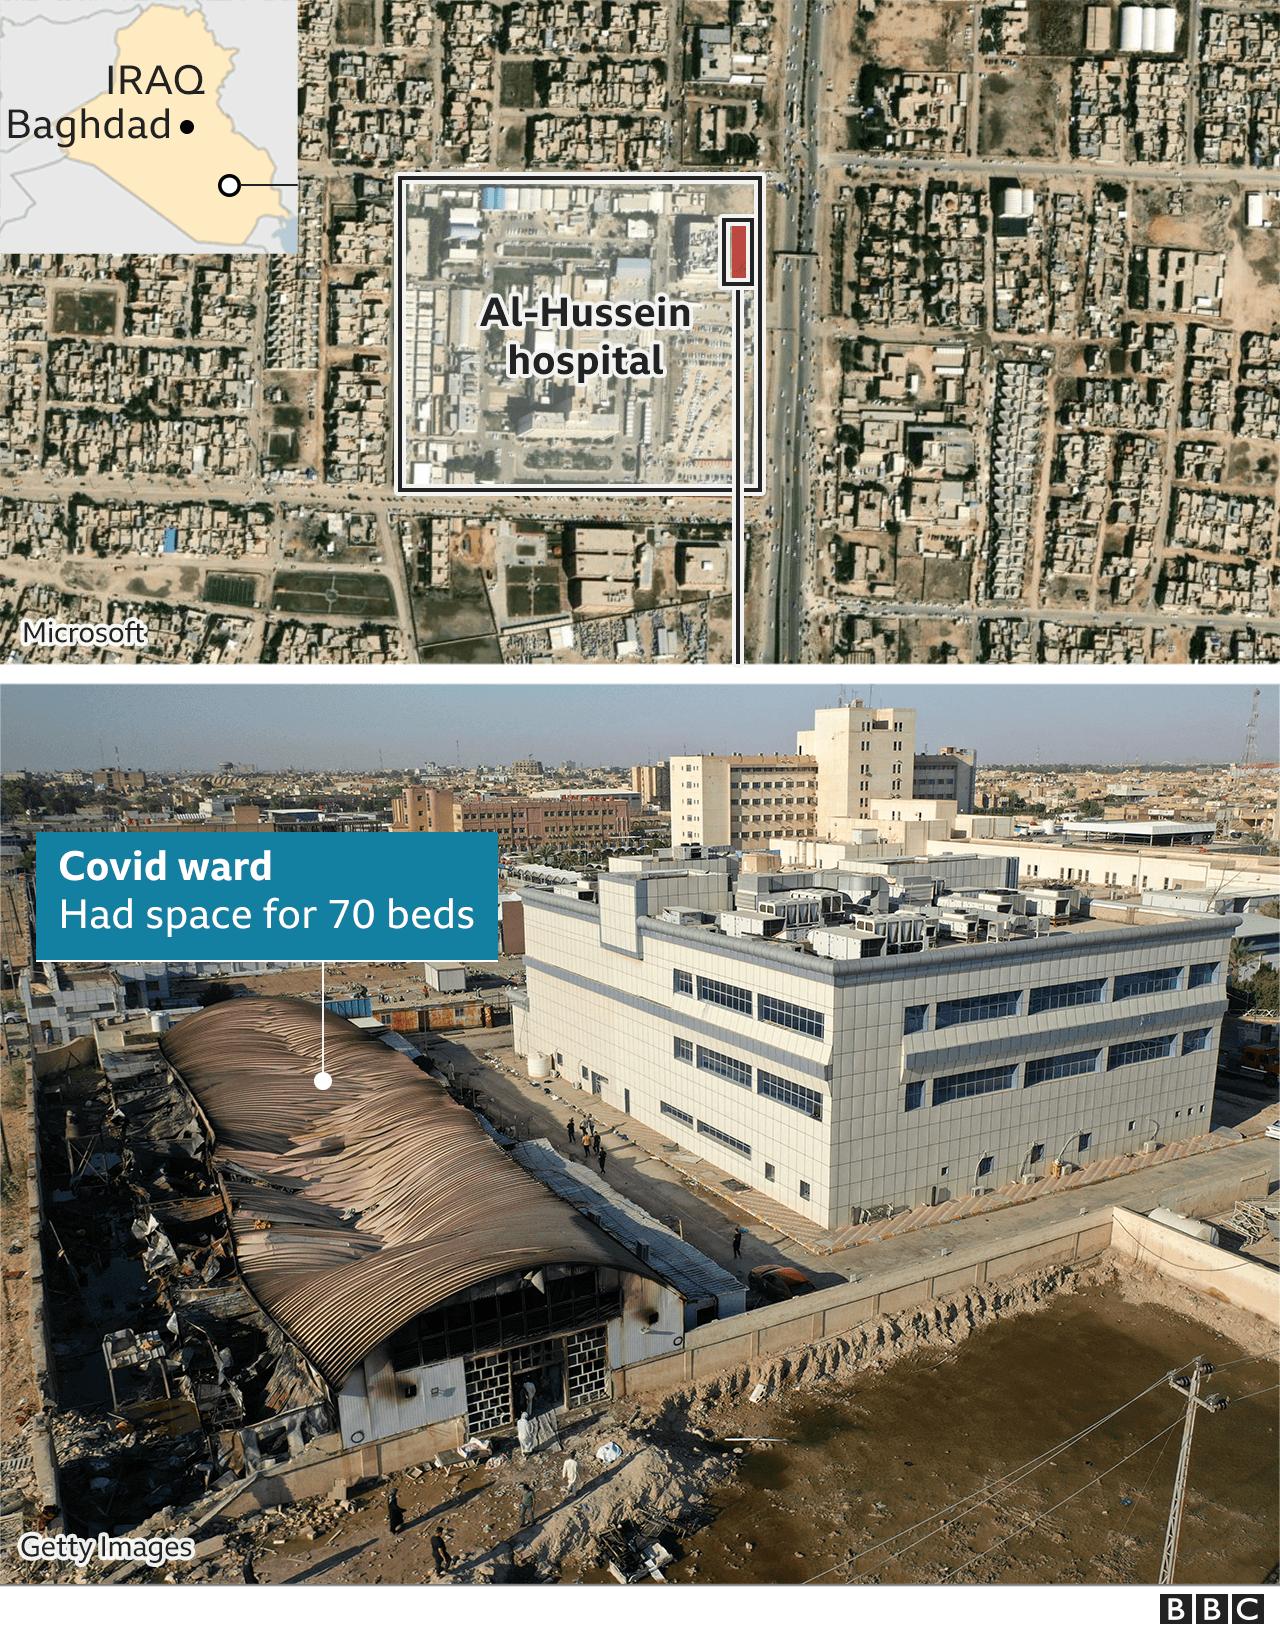 Iraq hospital fire: Protests as Covid ward blaze kills more than 90 thumbnail